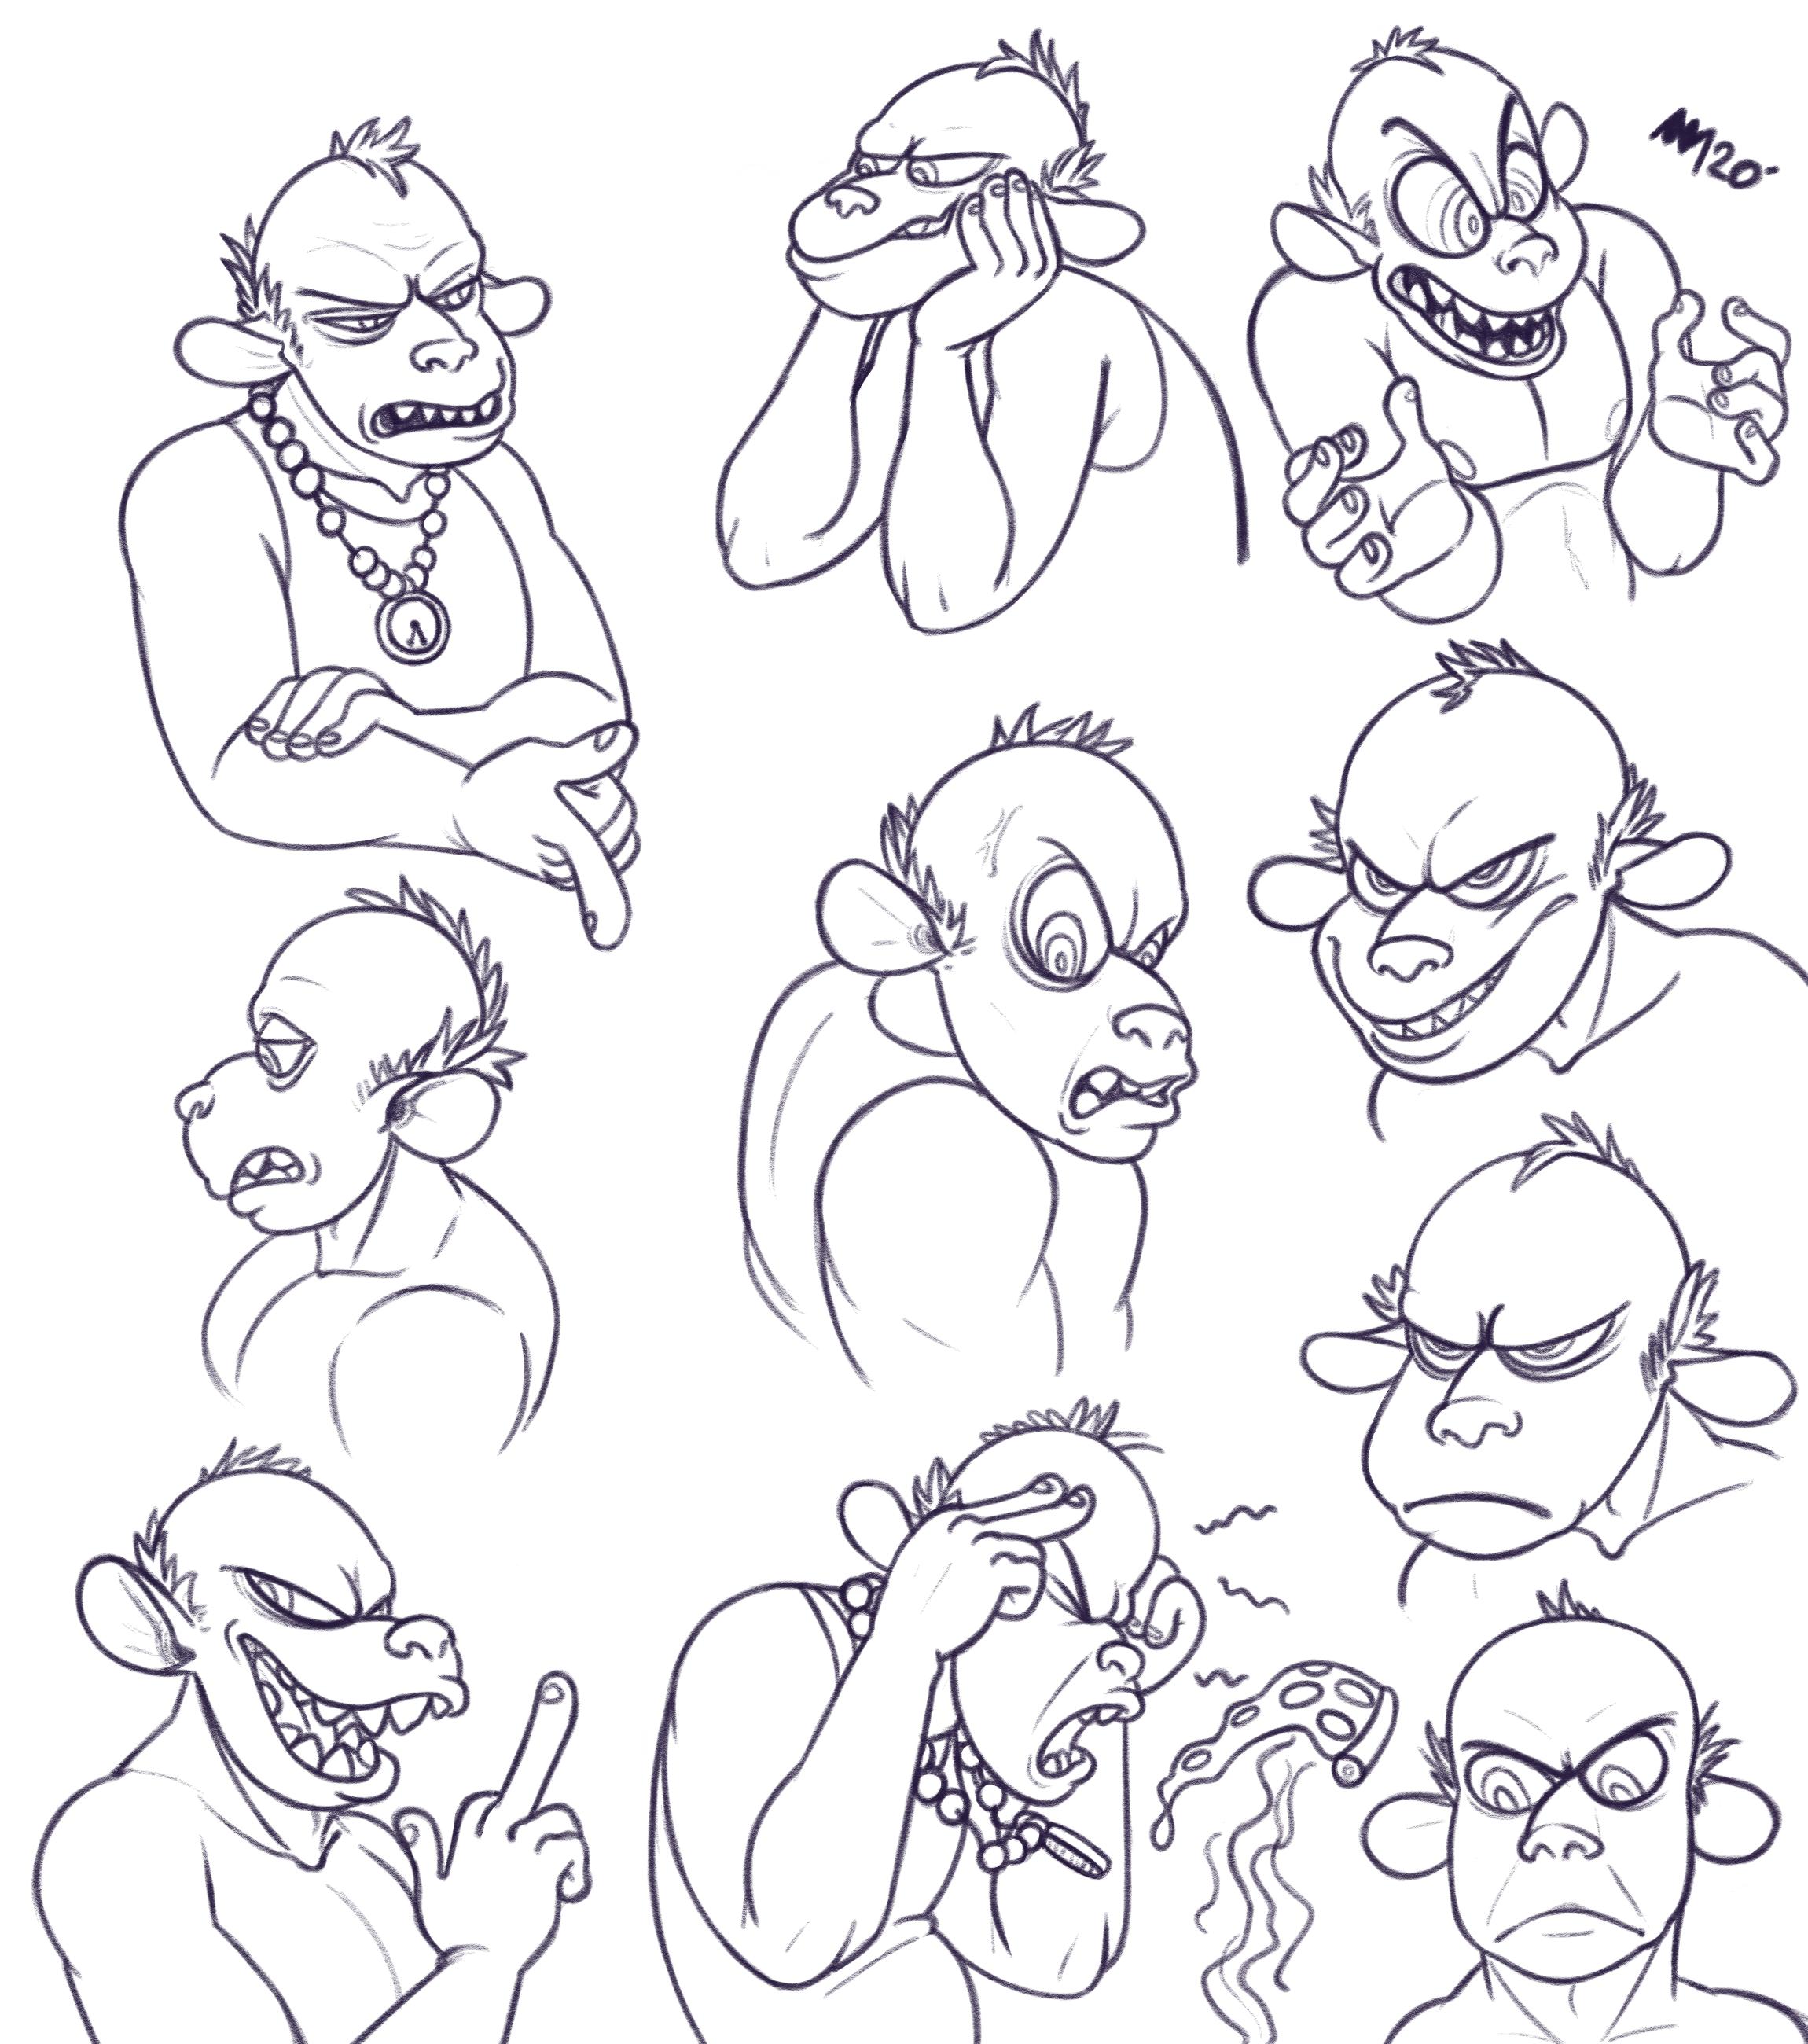 Faces of Gangsta Jim